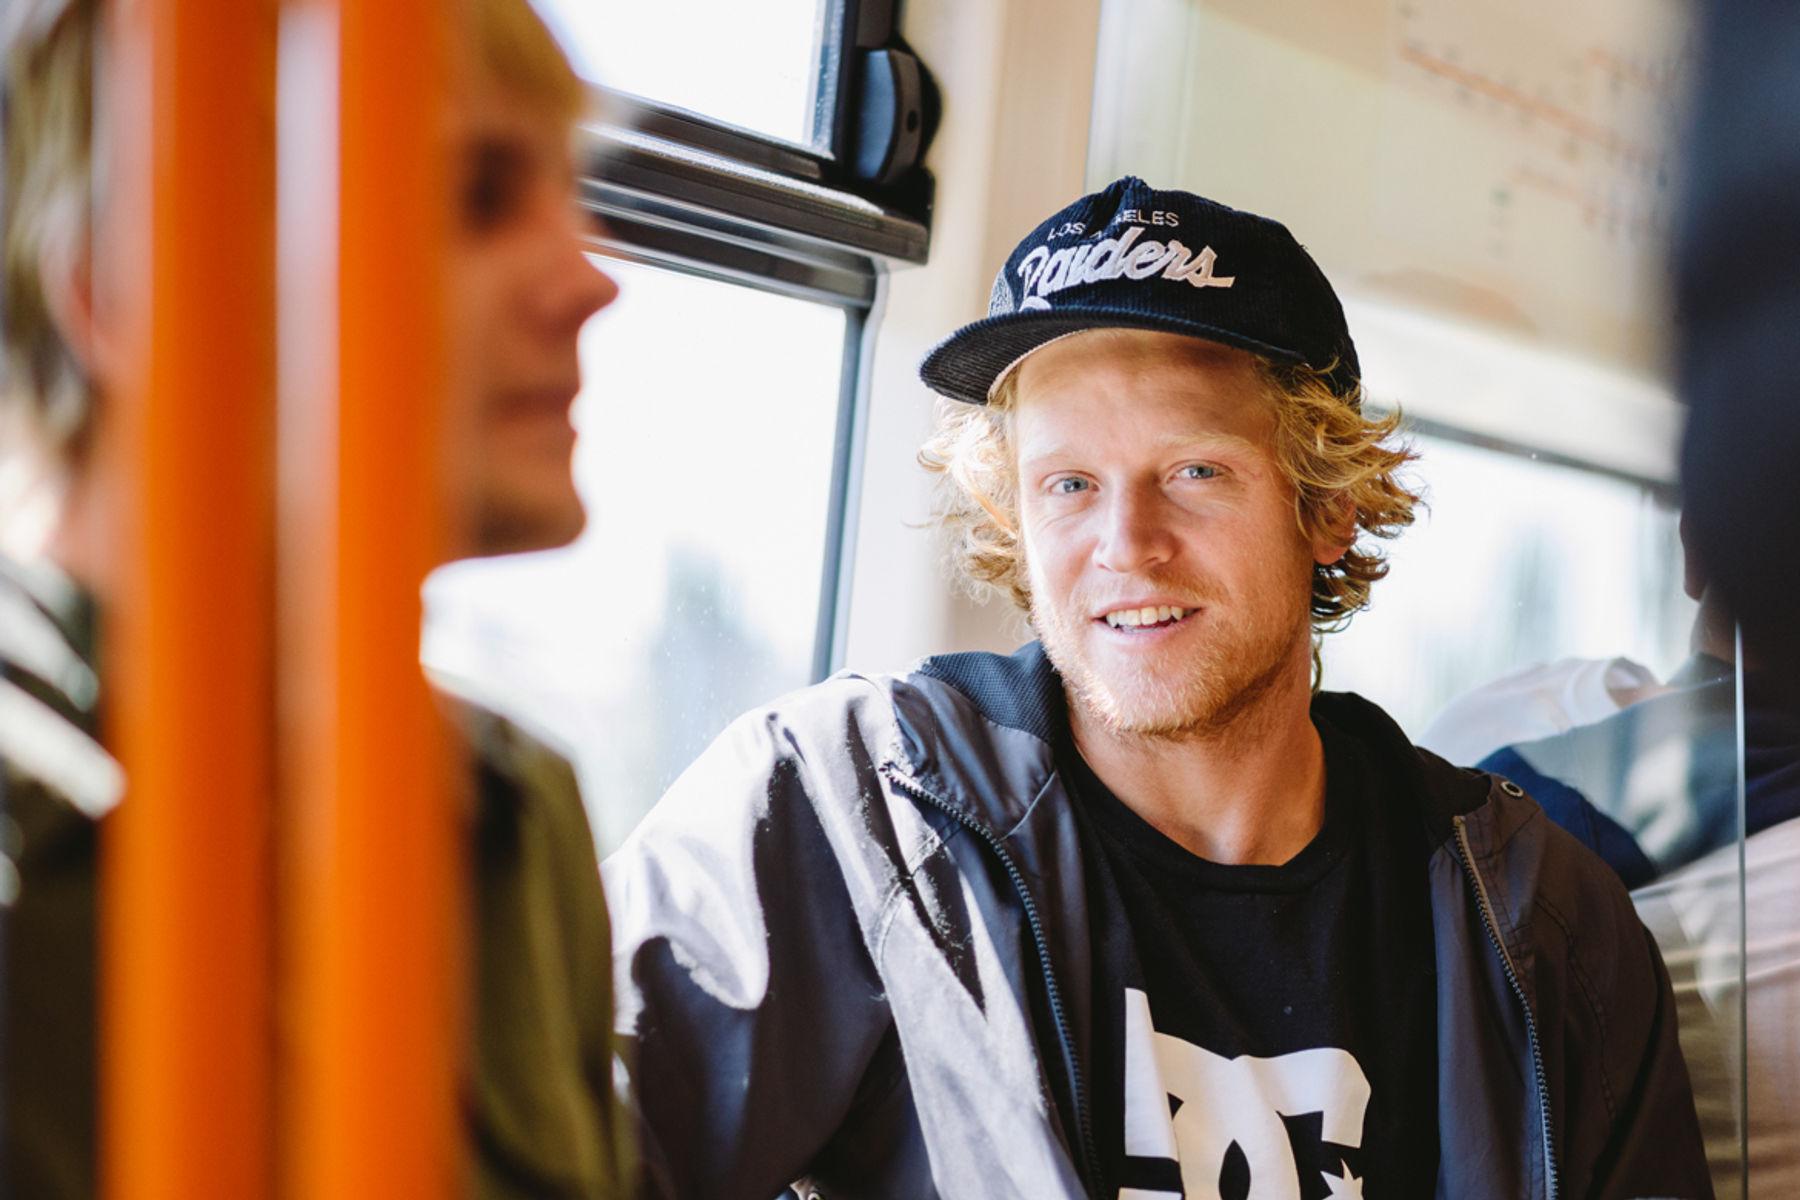 _IHC2858e-Madars-Apse-Wes-Kremer-DC-Special-Delivery-Skate-Tour-BTS-London-May-2015-Photographer-Maksim-Kalanep